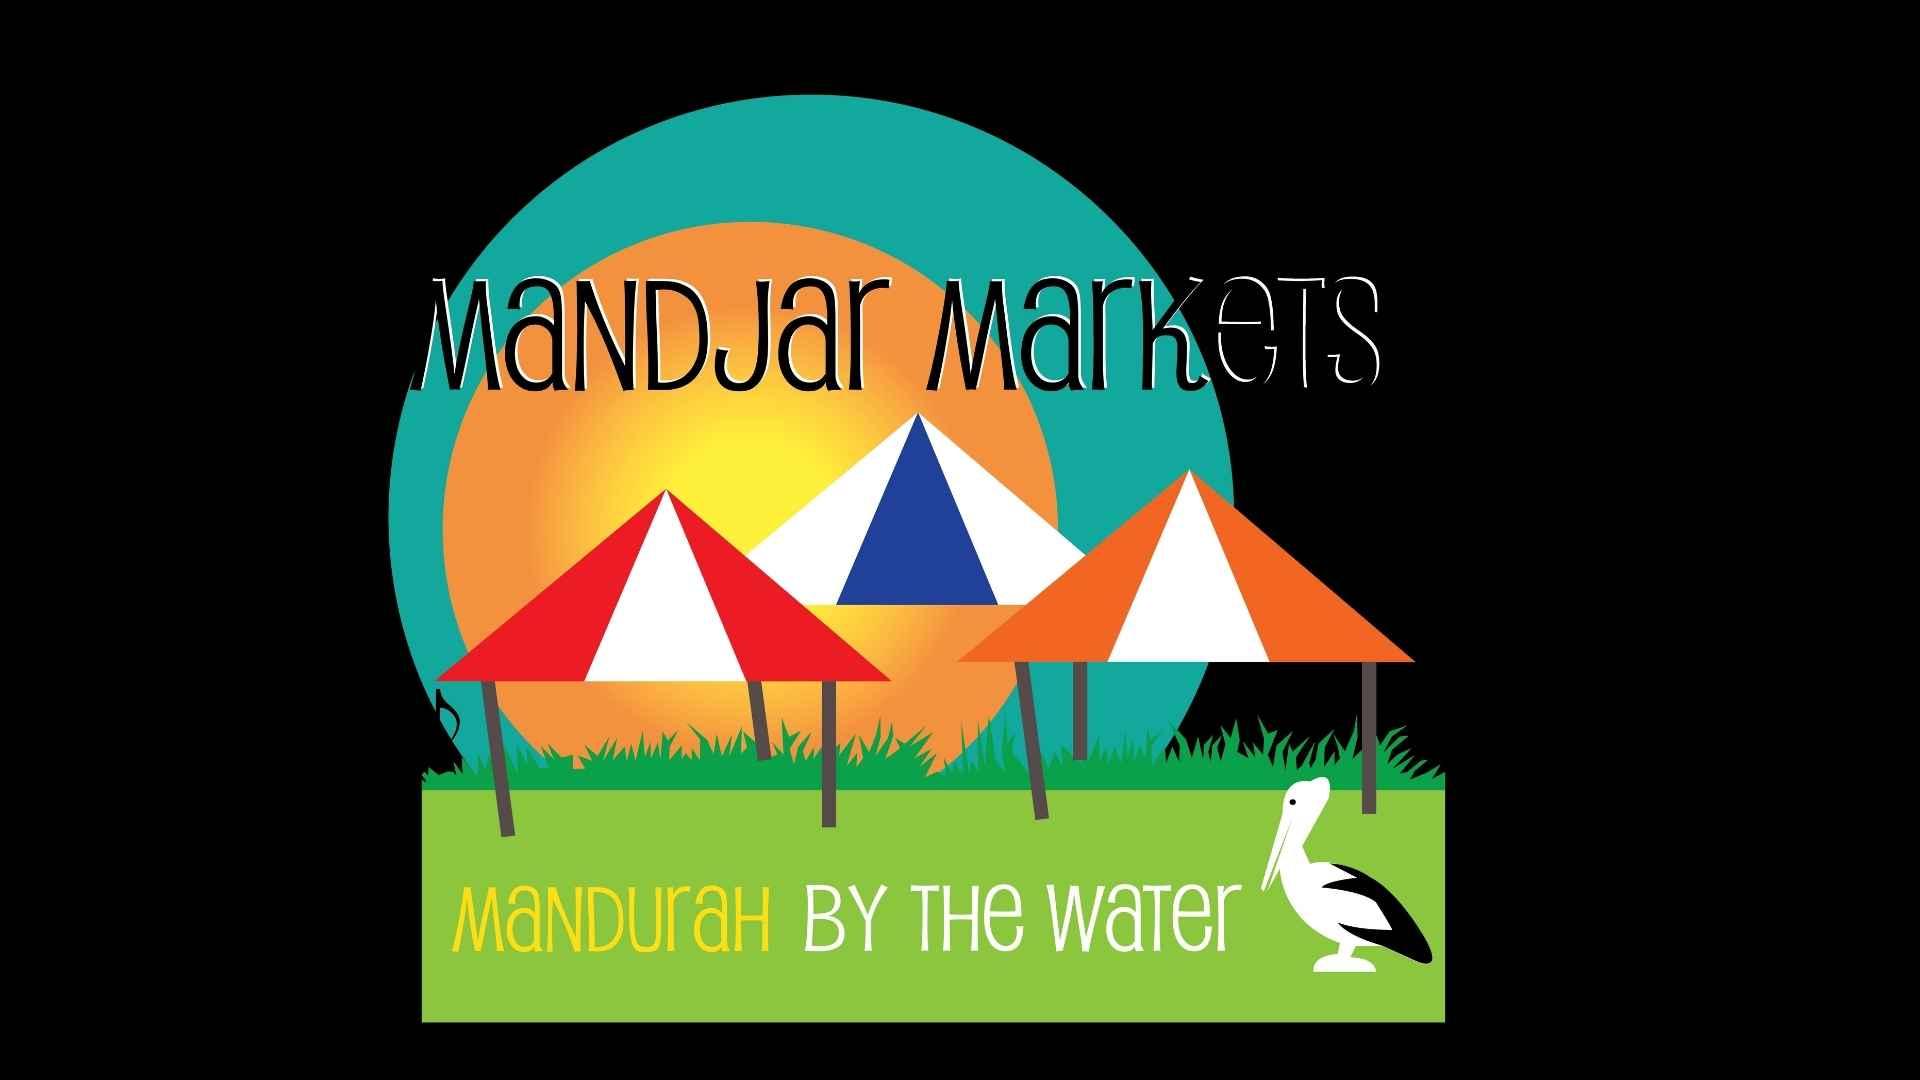 Mandjar-Markets-Mandurah